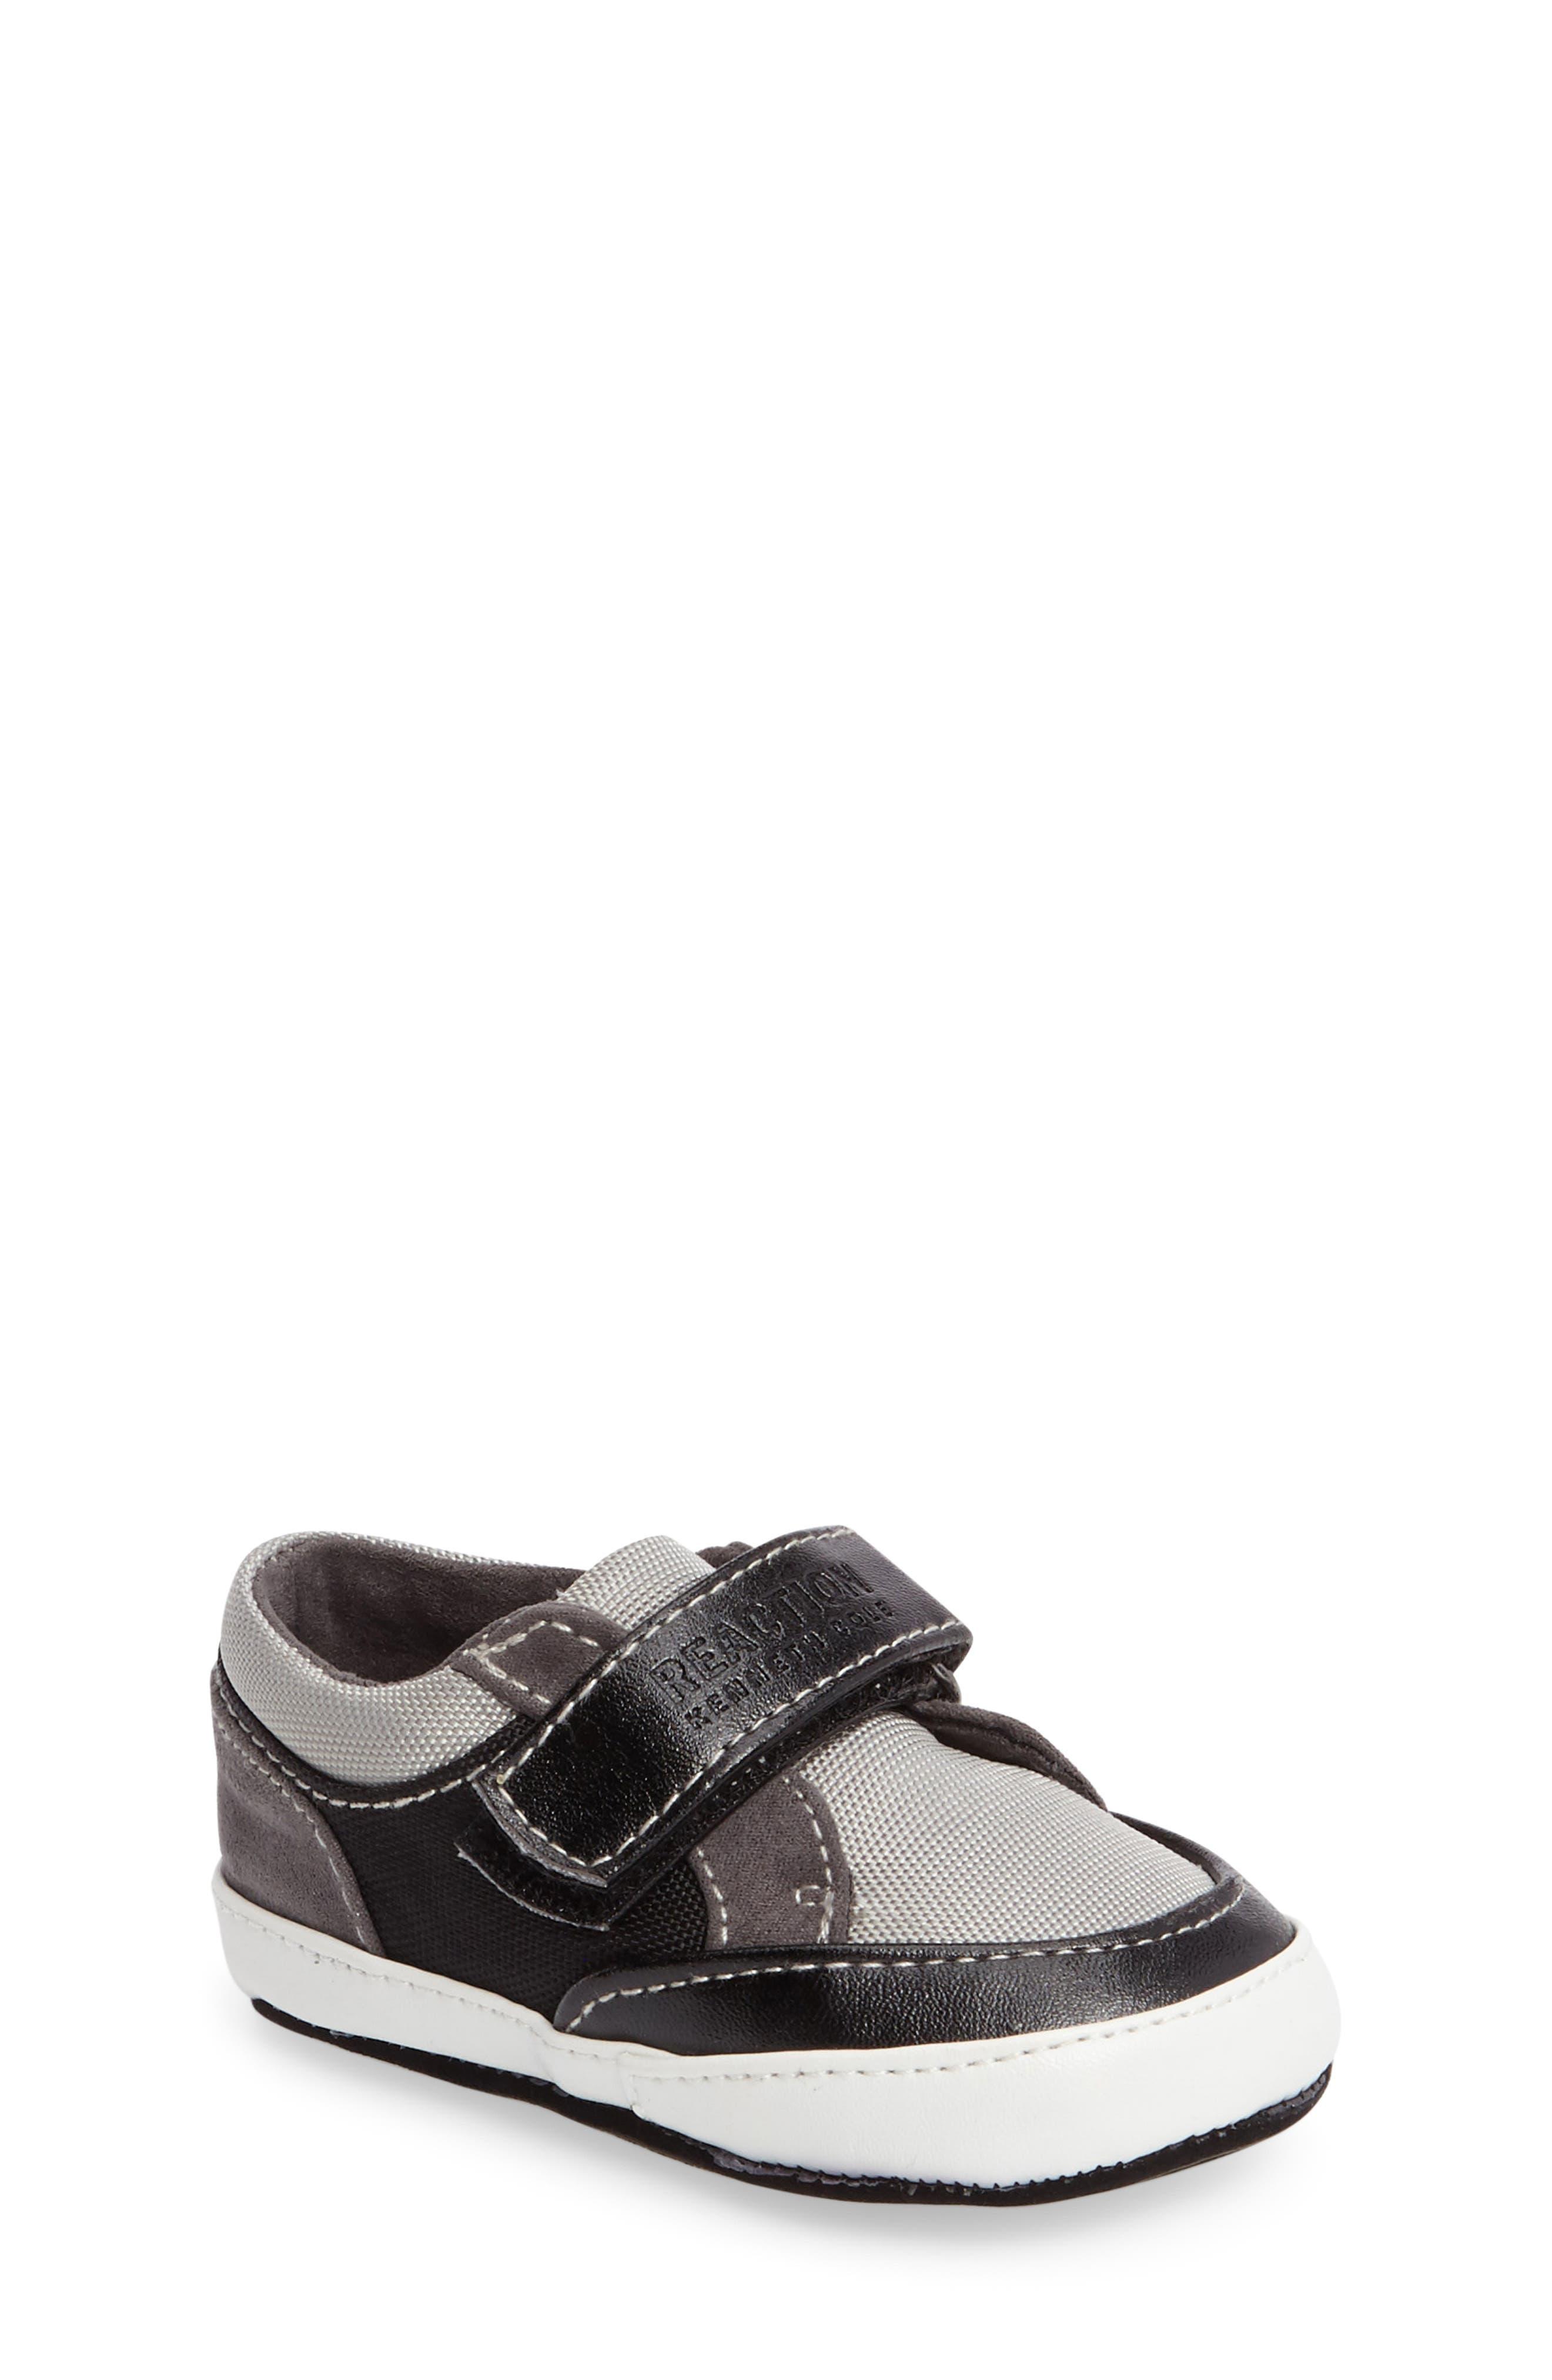 Danny Sneaker,                         Main,                         color, Black/ Grey